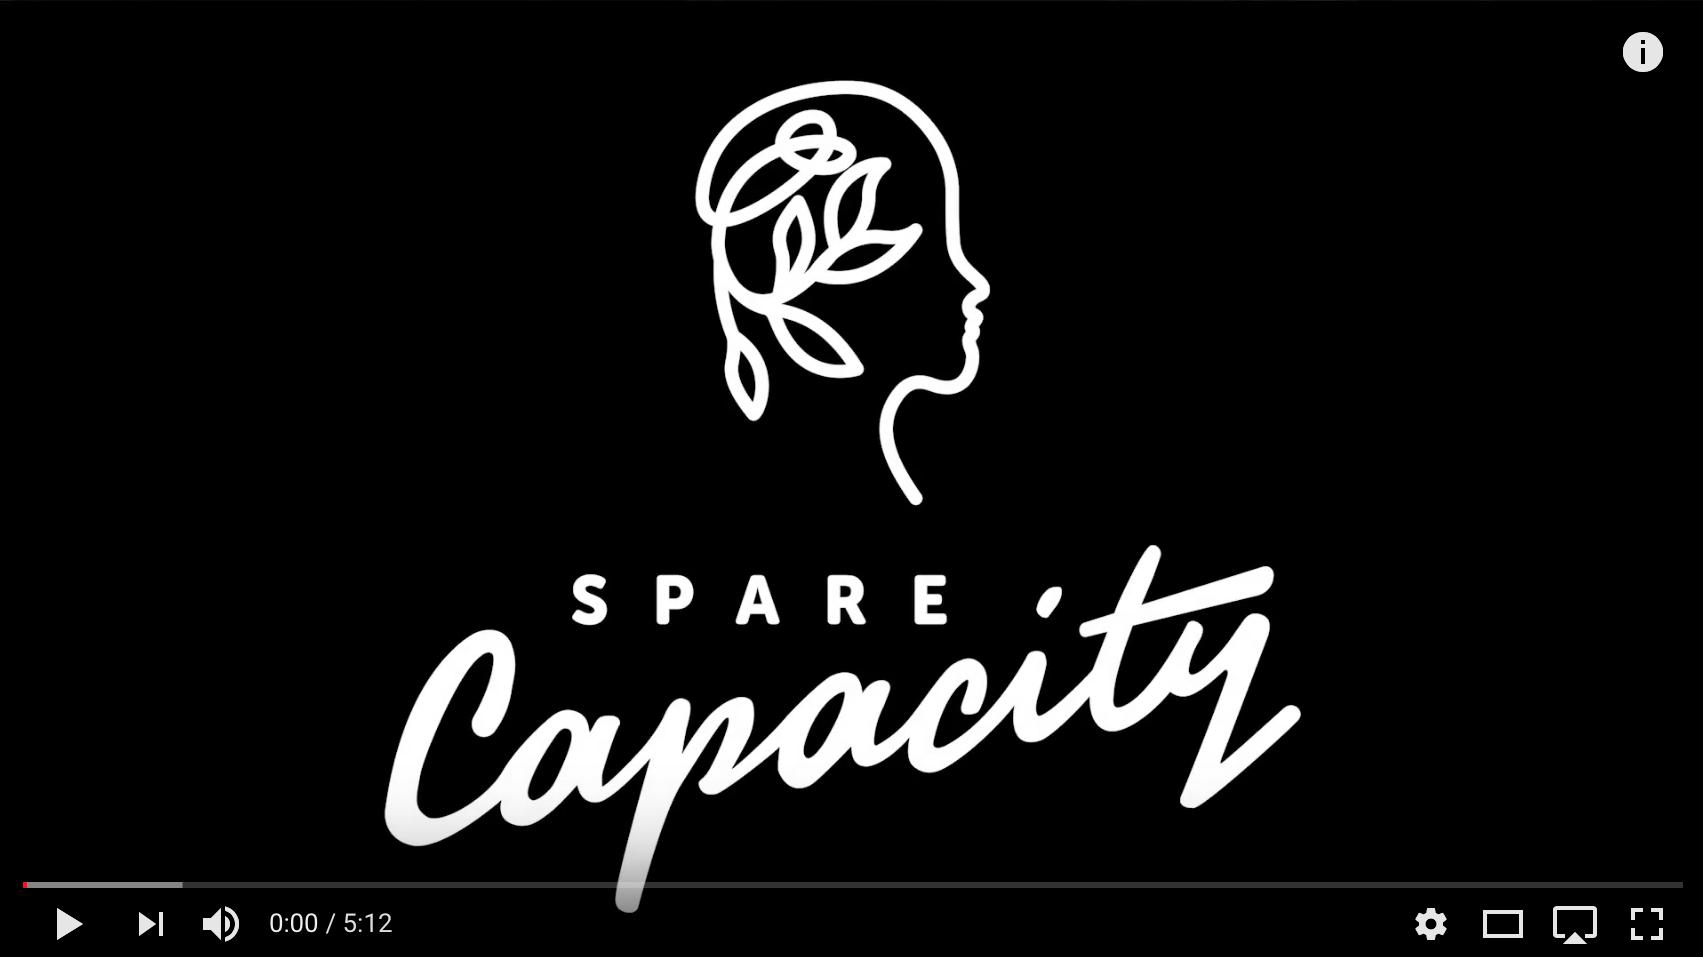 Spare Capacity Workshop Video